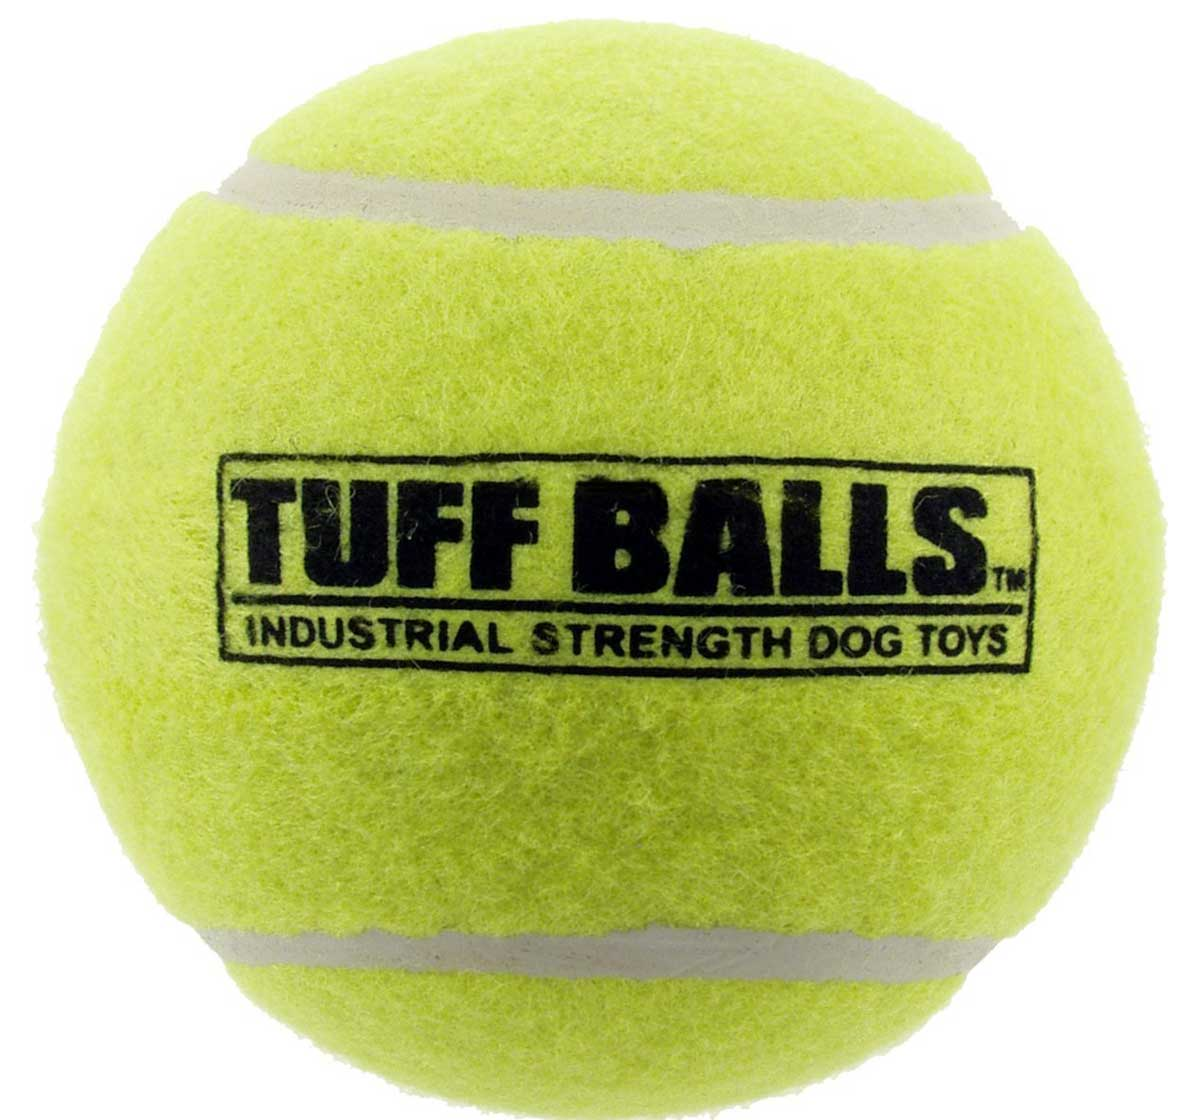 PETSPORT Jr. Tuff Balls Dog Toy - 2 Pack